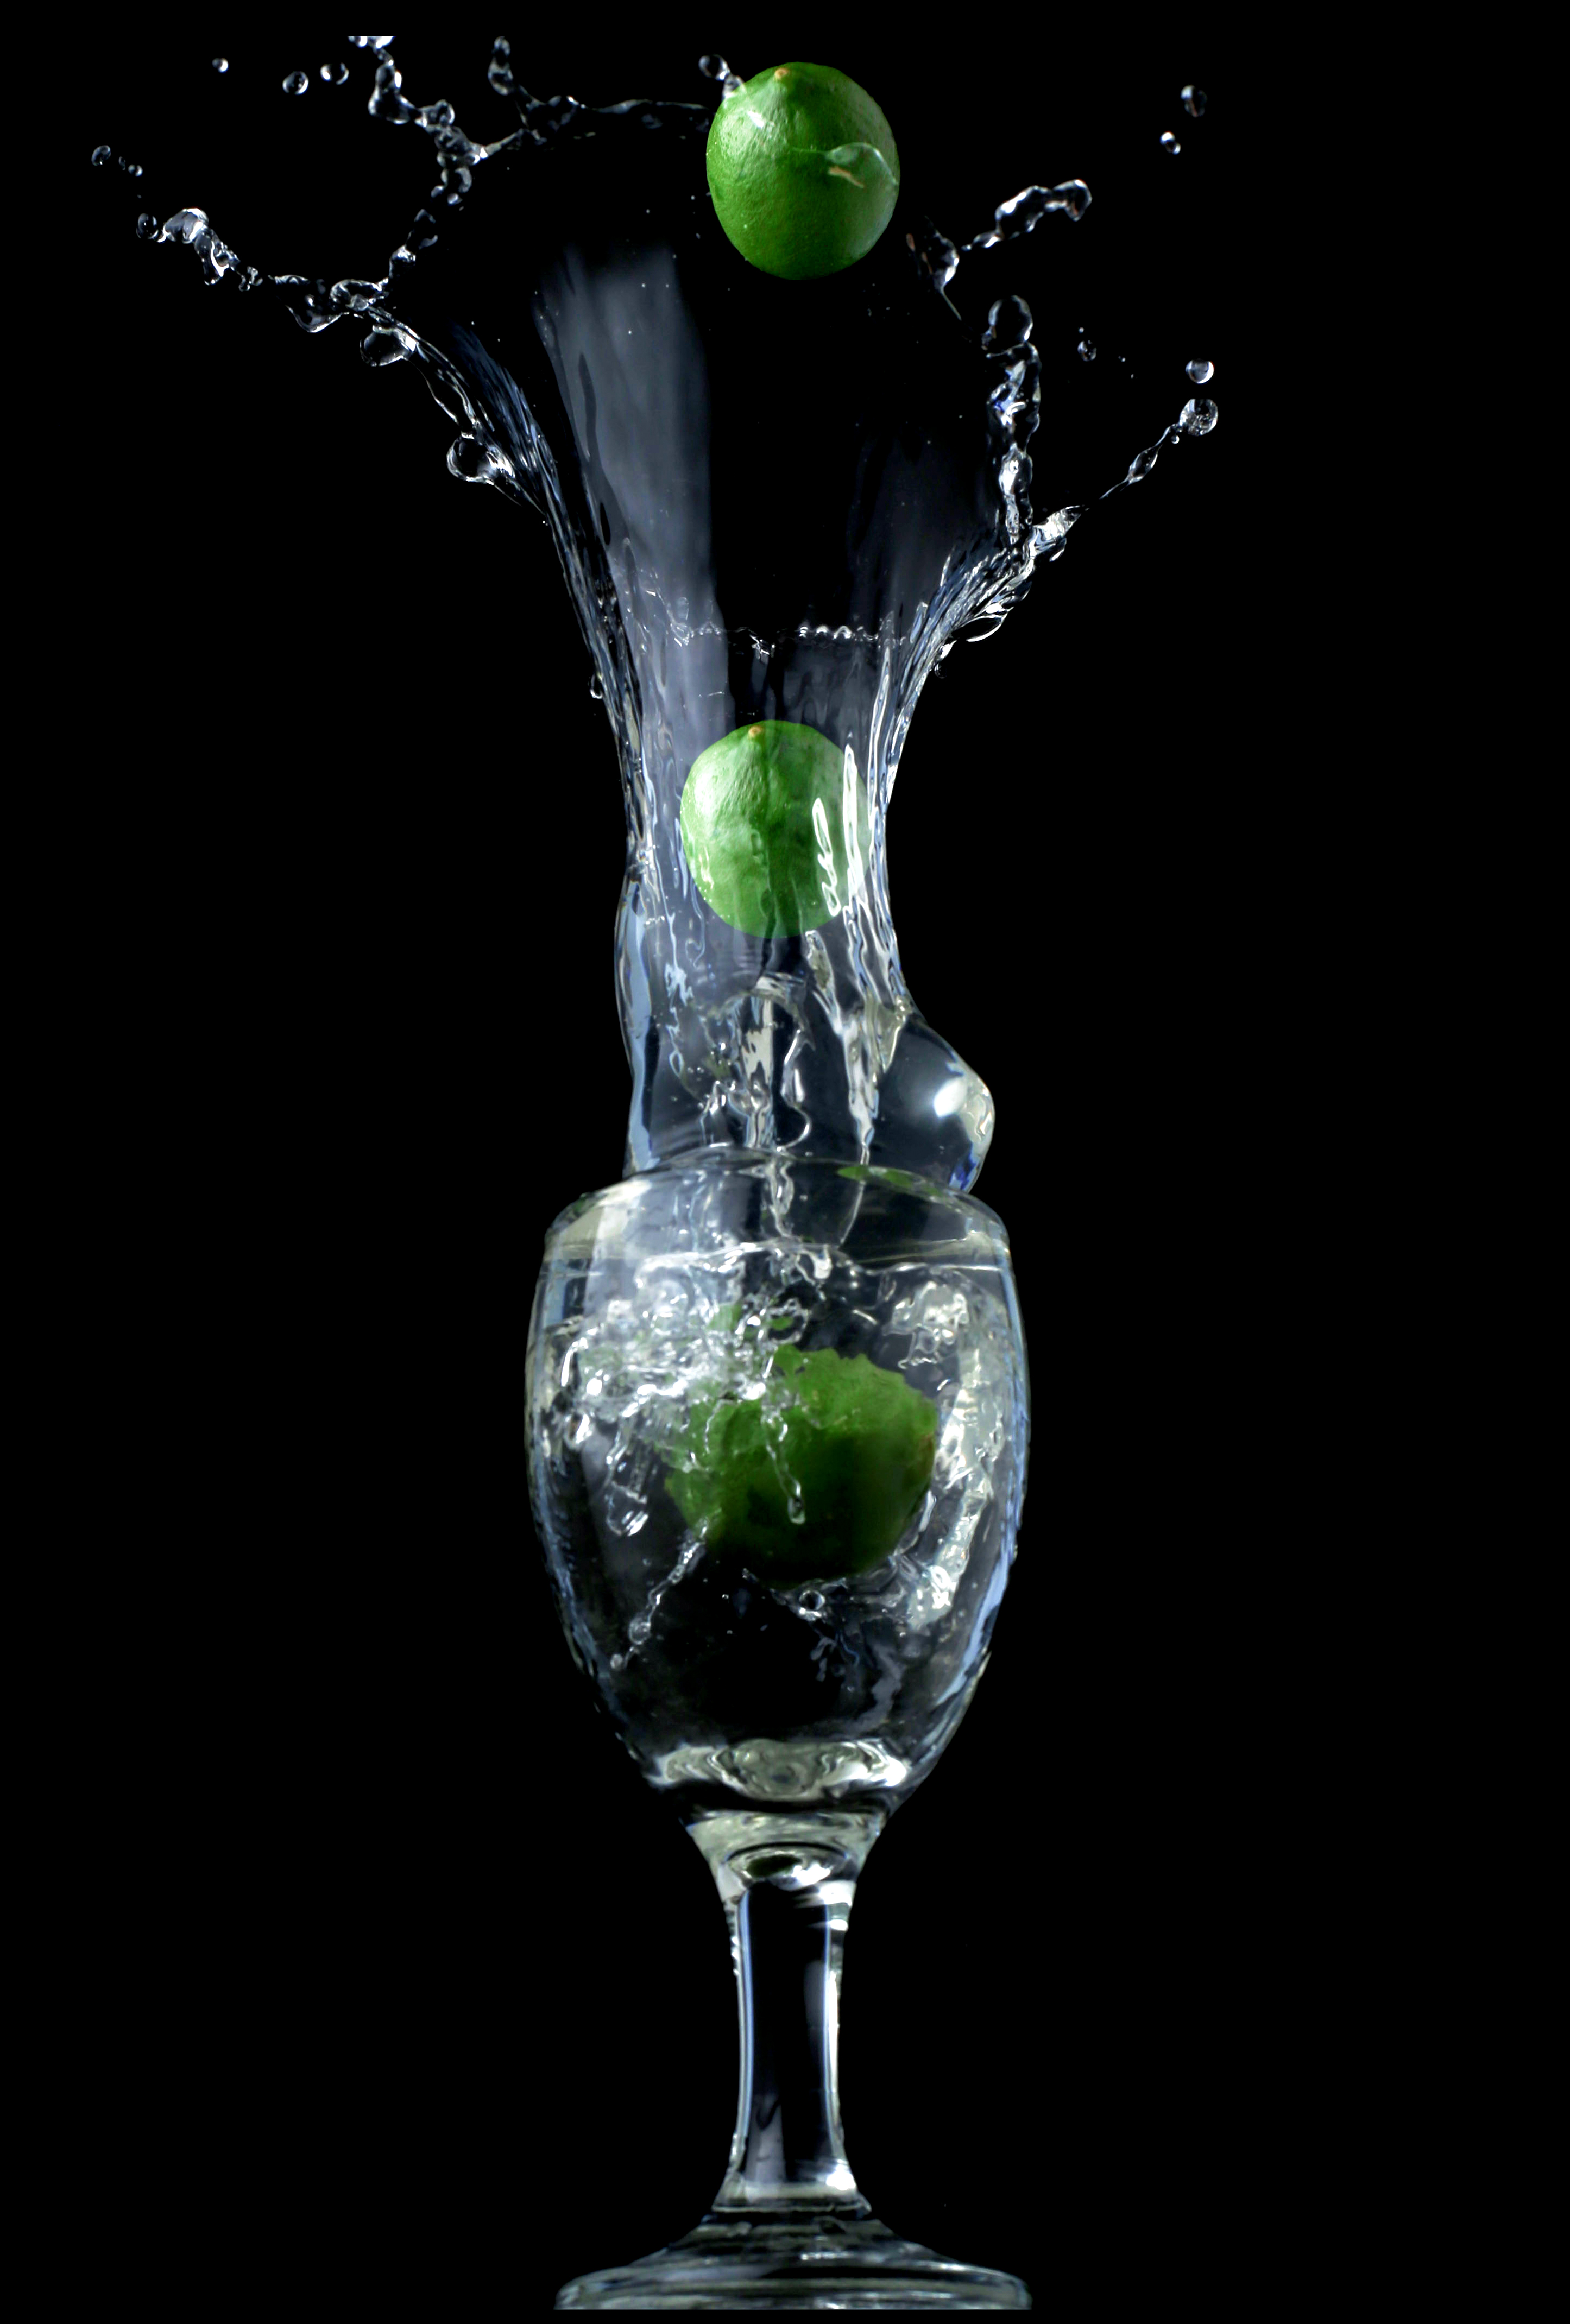 Drink More Water Than Drink Beverage